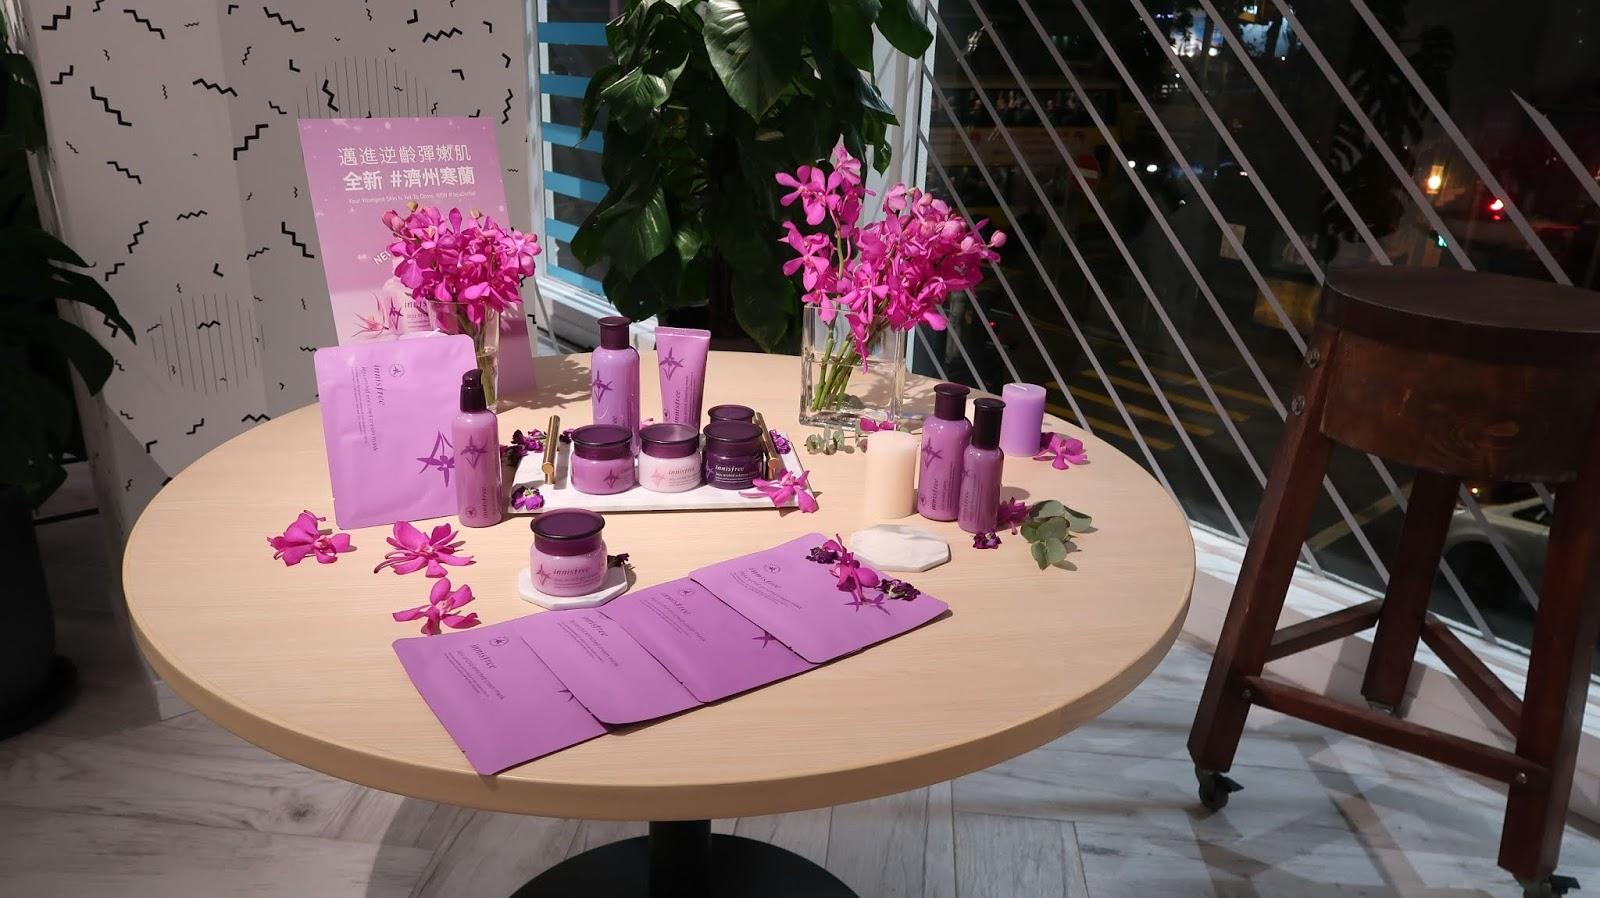 Dekoration Online Shop Günstig Elegant Beautylife Hk 【♥ Innisfree ♥ã€'æ¿Ÿå·žè˜èŠ±å…¨æ•ˆä¿ è·ç³ åˆ—